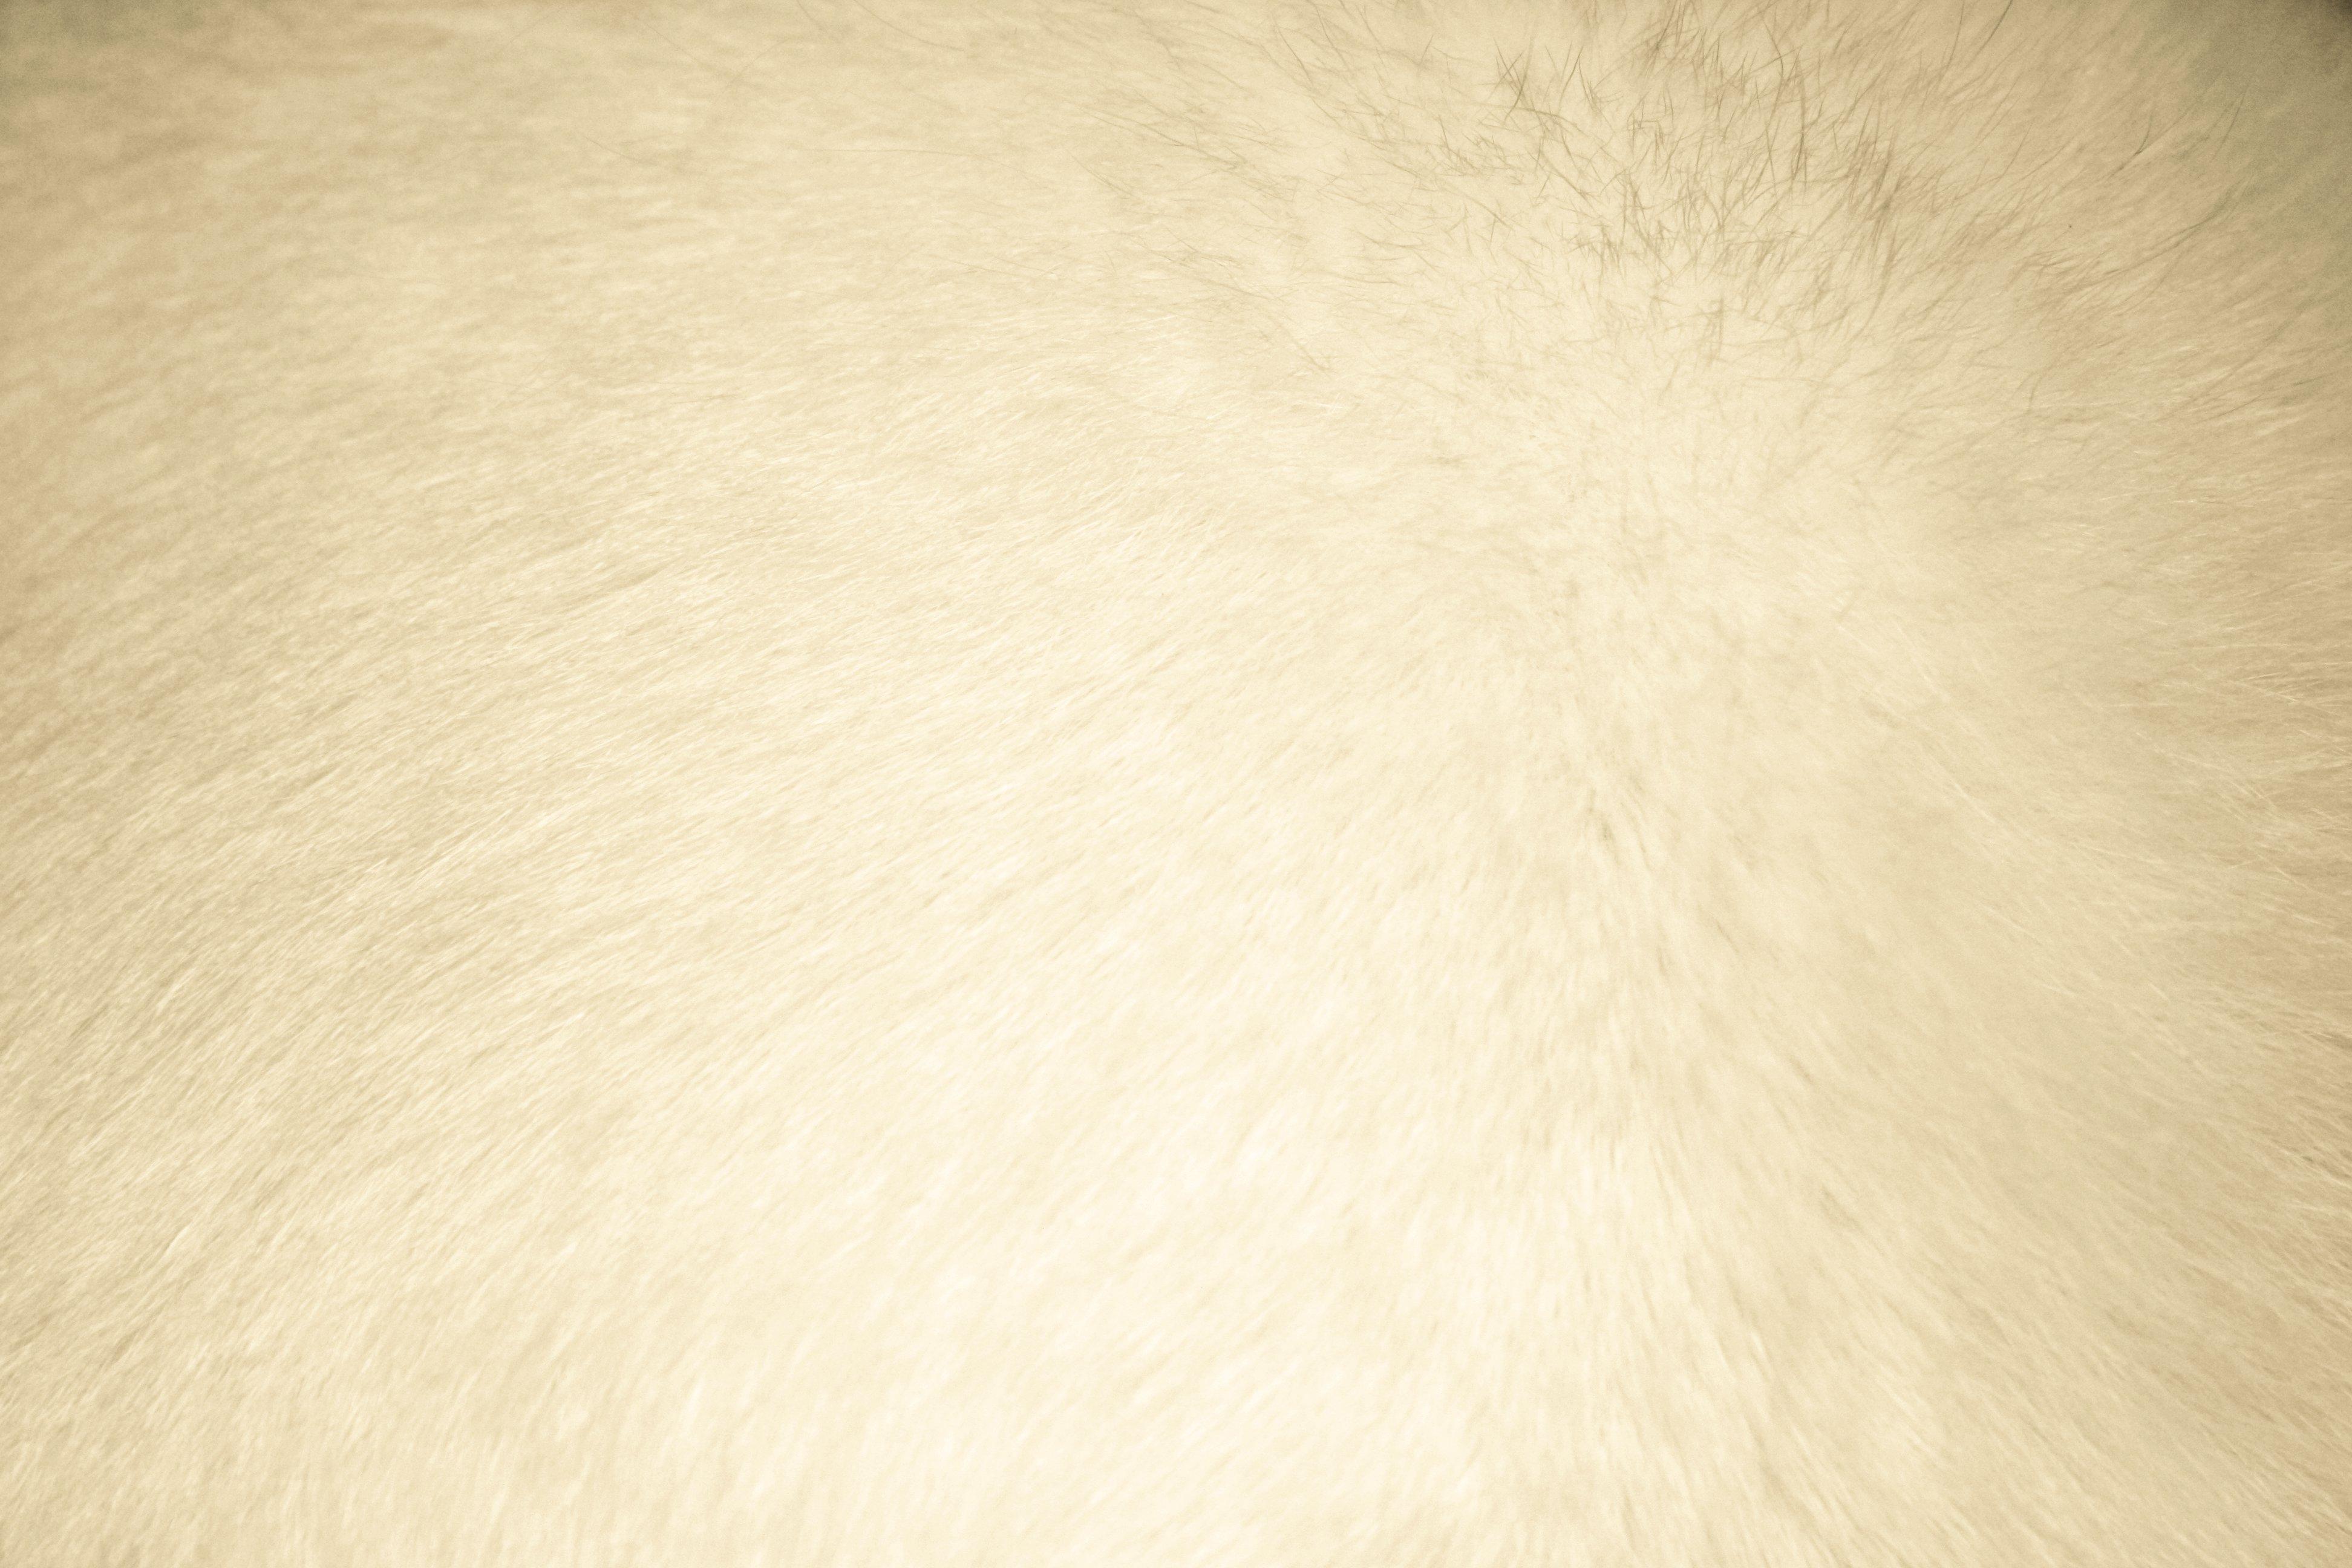 Beige Fur Texture   High Resolution Photo   Dimensions 3888 3888x2592